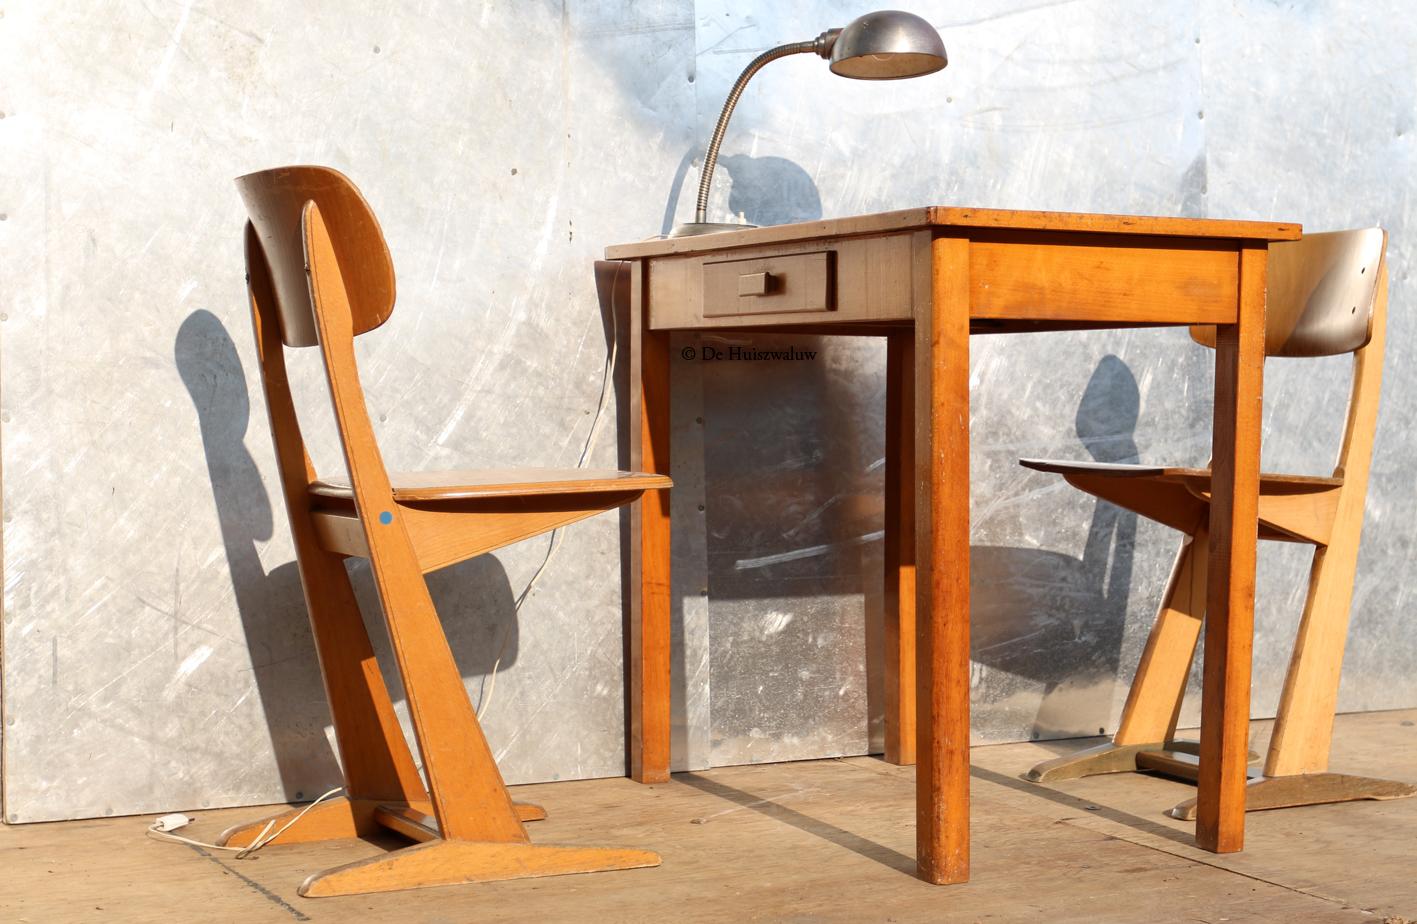 Keukentafel hoog: de perfecte keukentafels en keukenstoelen.